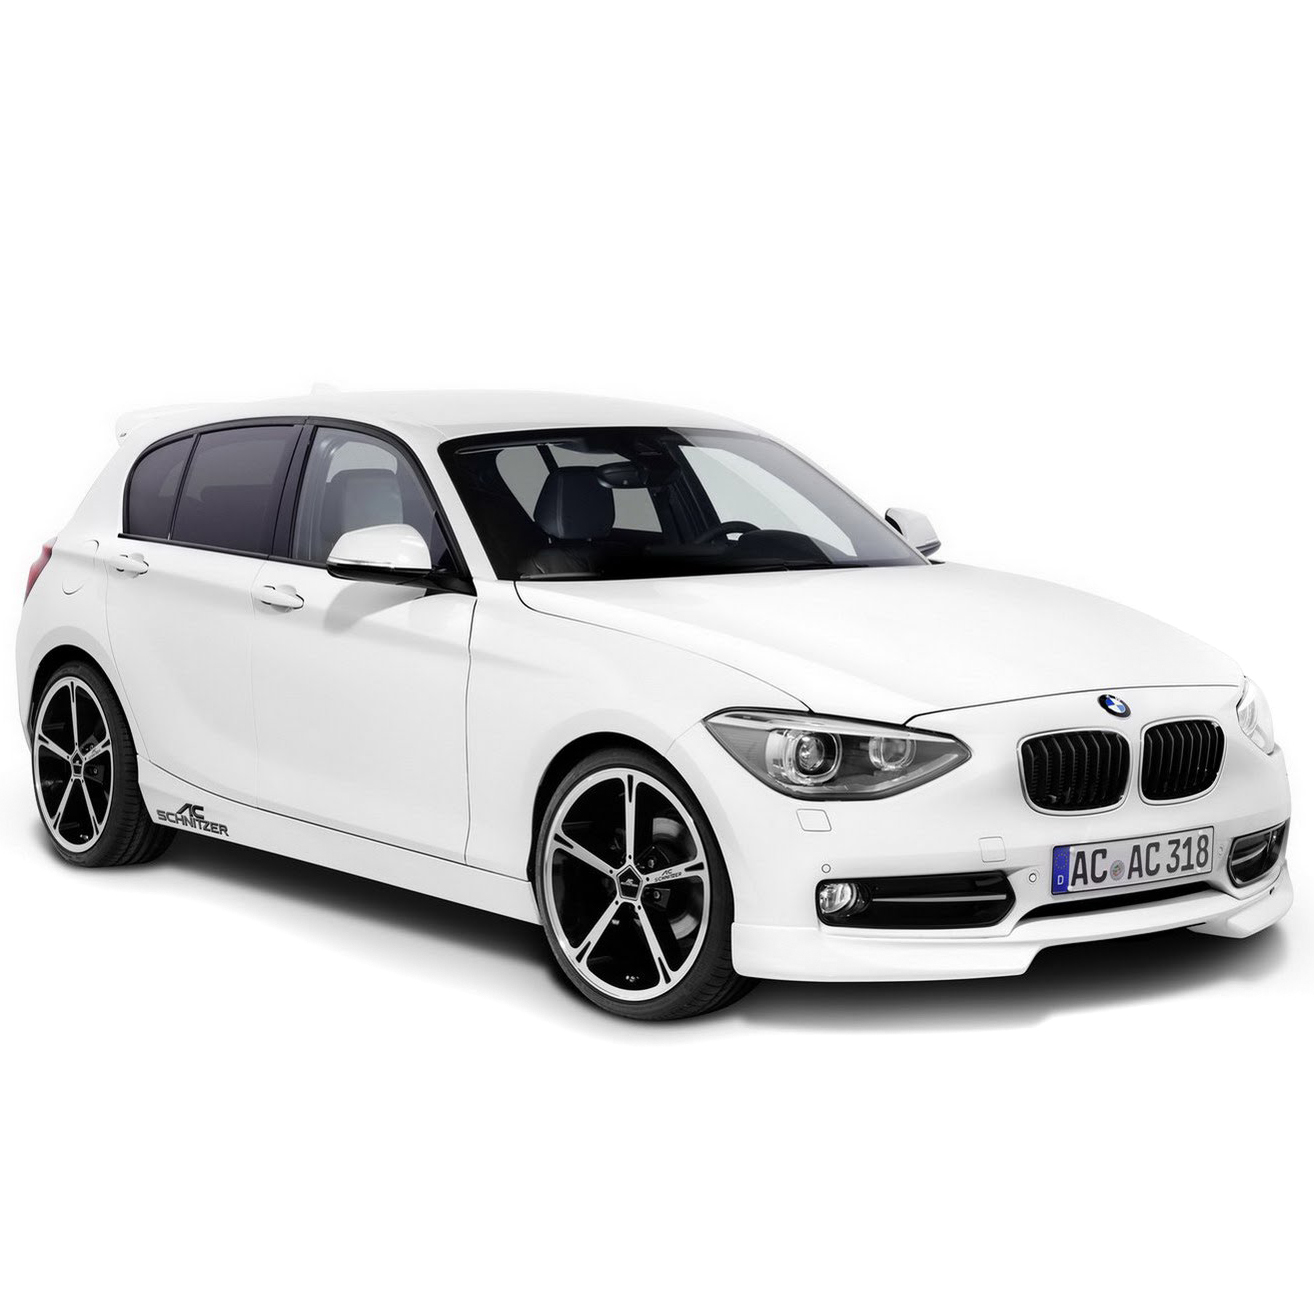 BMW 1 Series (F20) 2011 - 2019